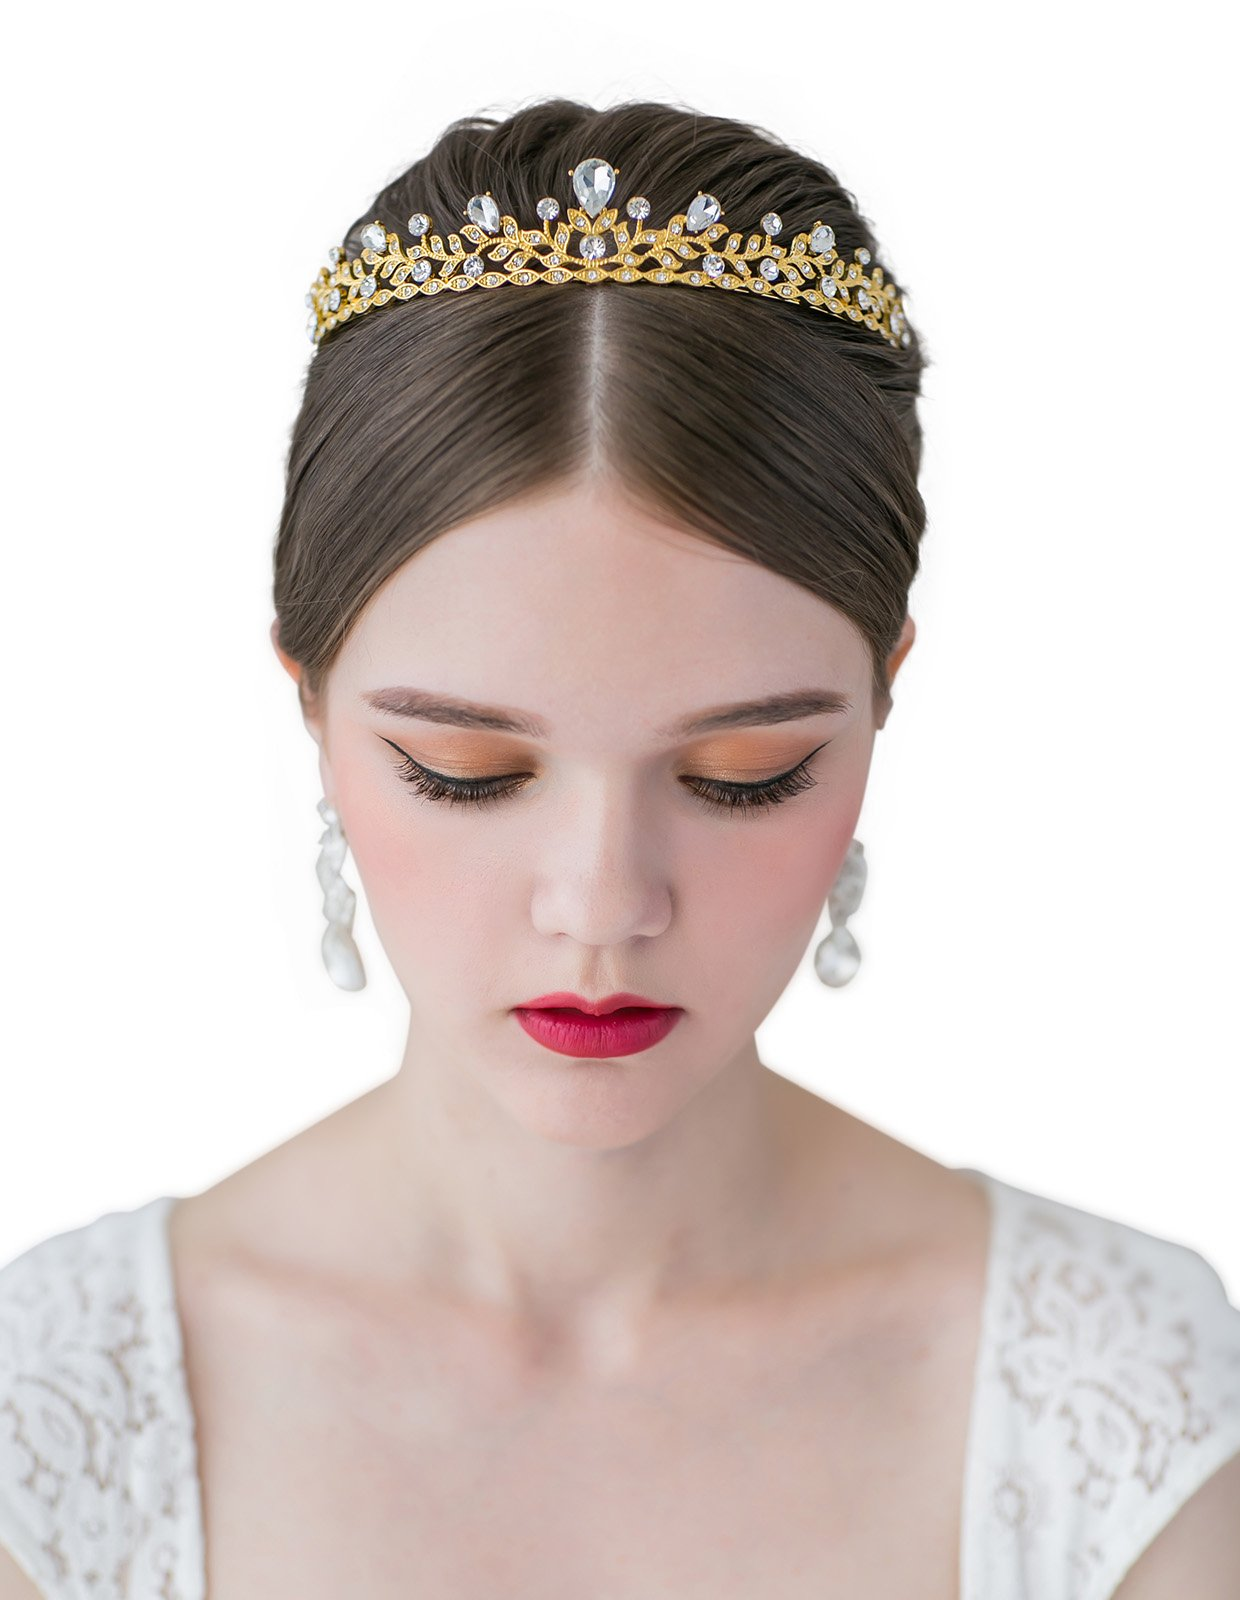 SWEETV Sparkly Crystal Crown Princess Tiara Rhinestone Leaf Pageant Wedding Hair Jewelry, Gold